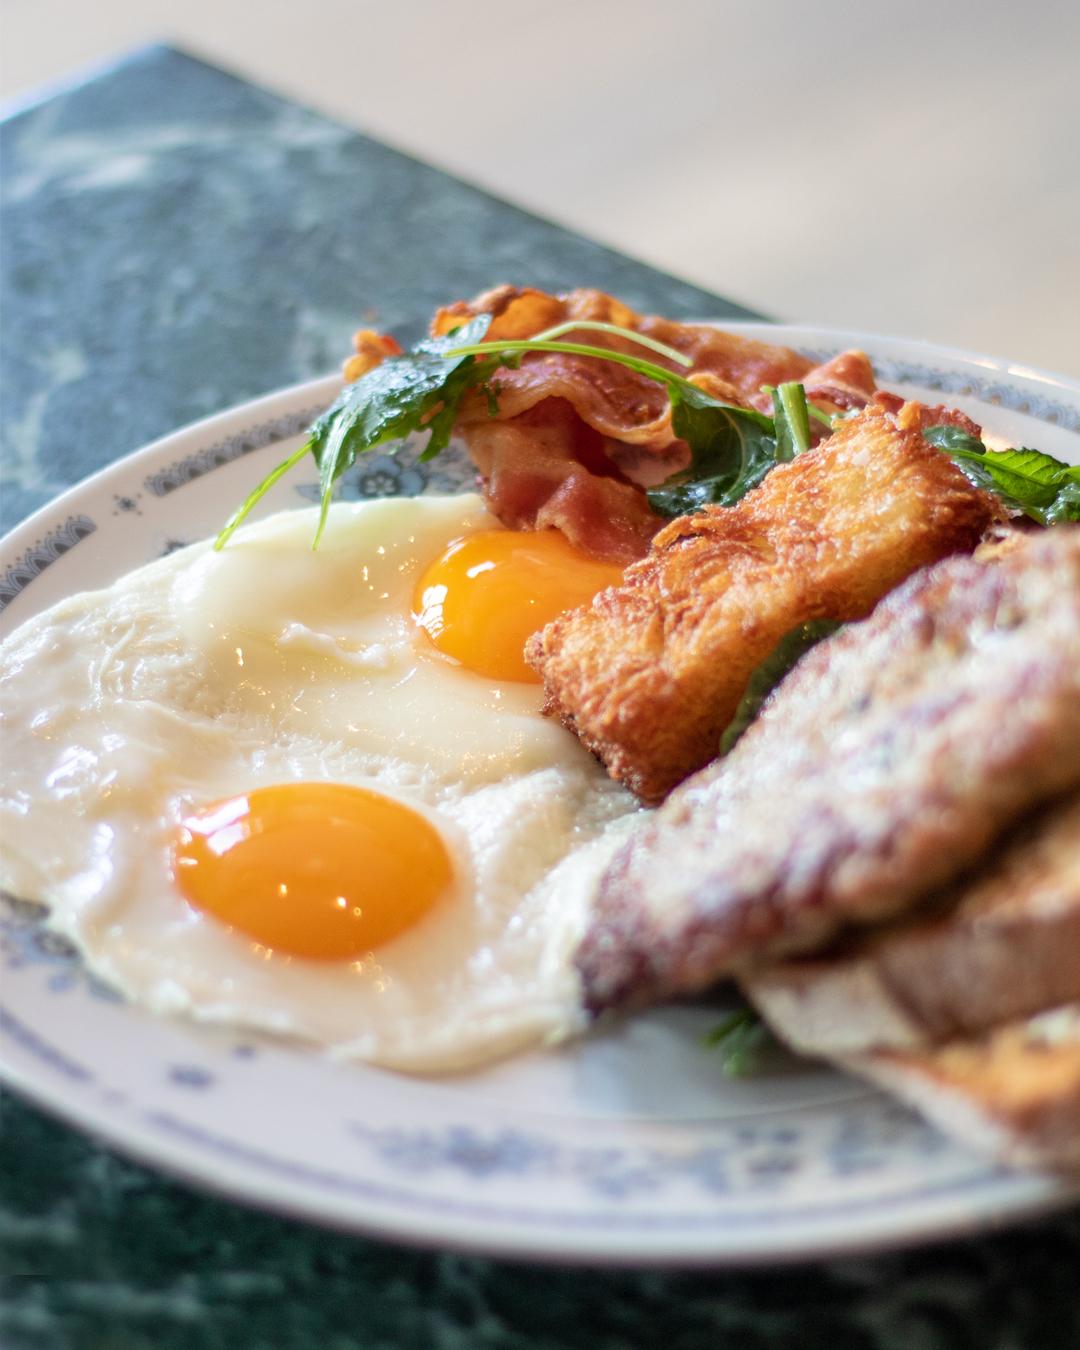 PH_EarlyBird-breakfastplate01.jpg